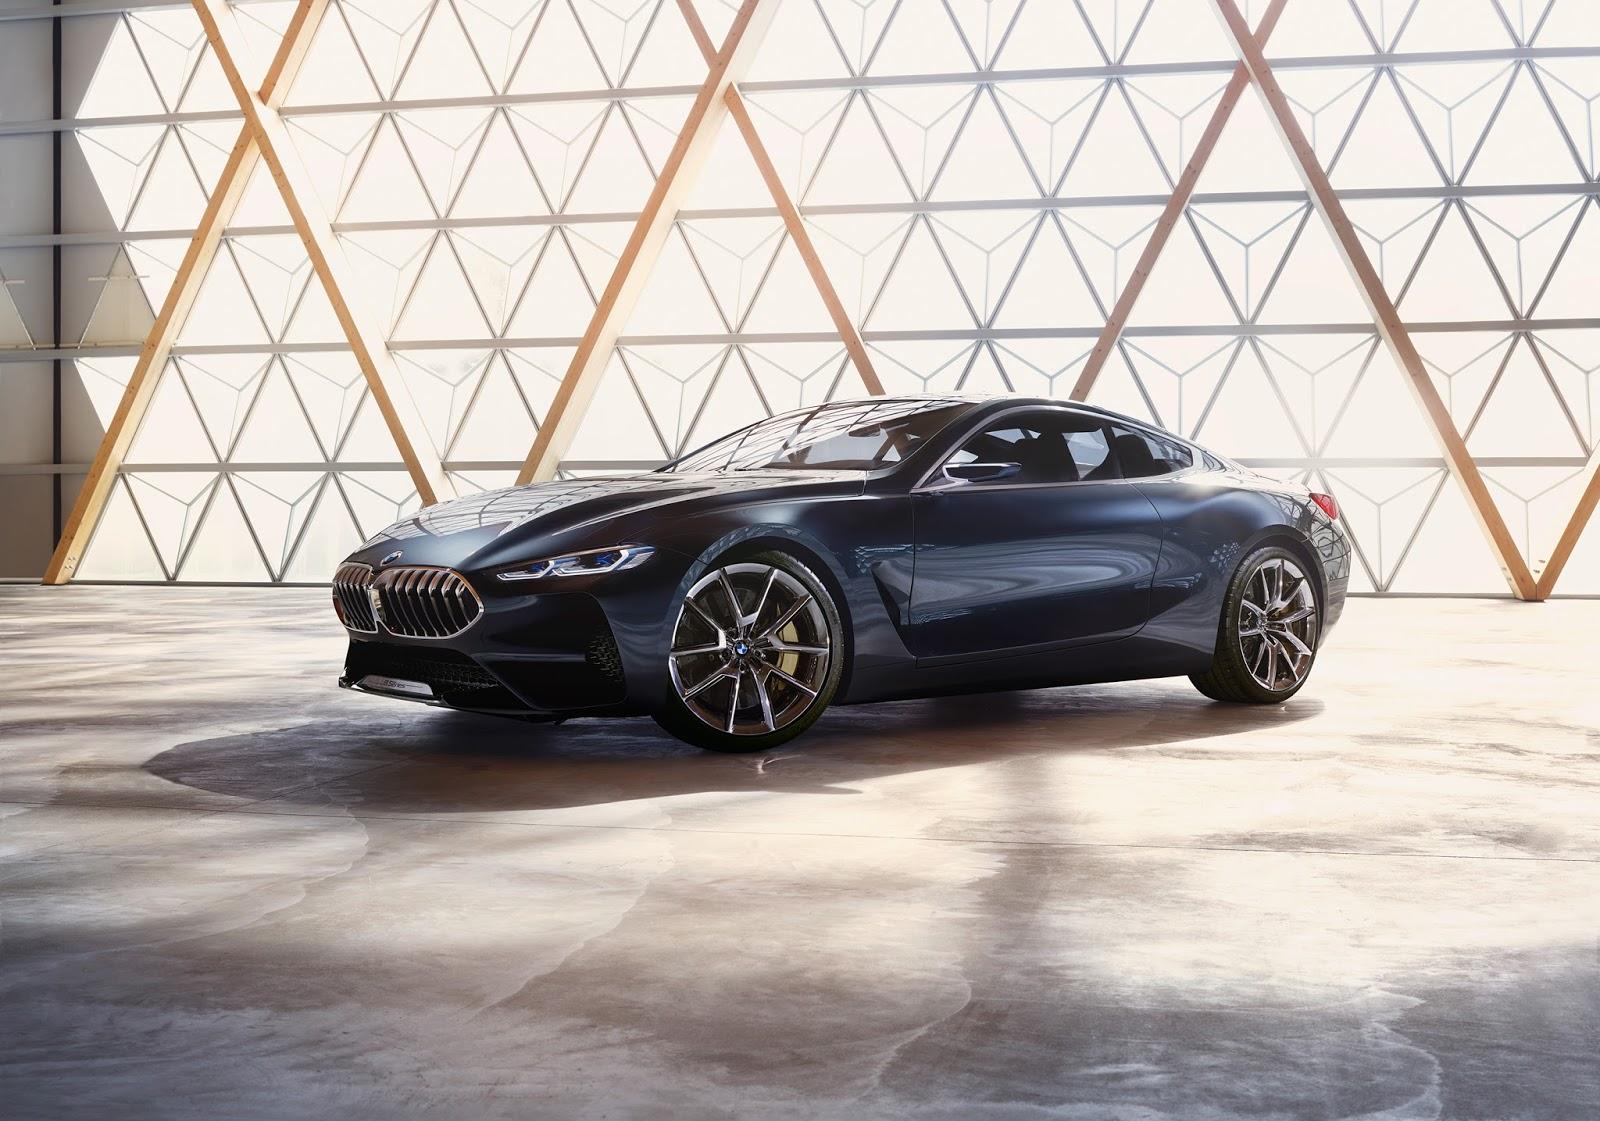 P90260634 highRes bmw concept 8 series Η BMW Σειρά 8 Coupe είναι η πεμπτουσία των μελλοντικών σπορ αυτοκινήτων BMW, BMW 8, BMW Concept, BMW Concept 8 Series, COUPE, dream car